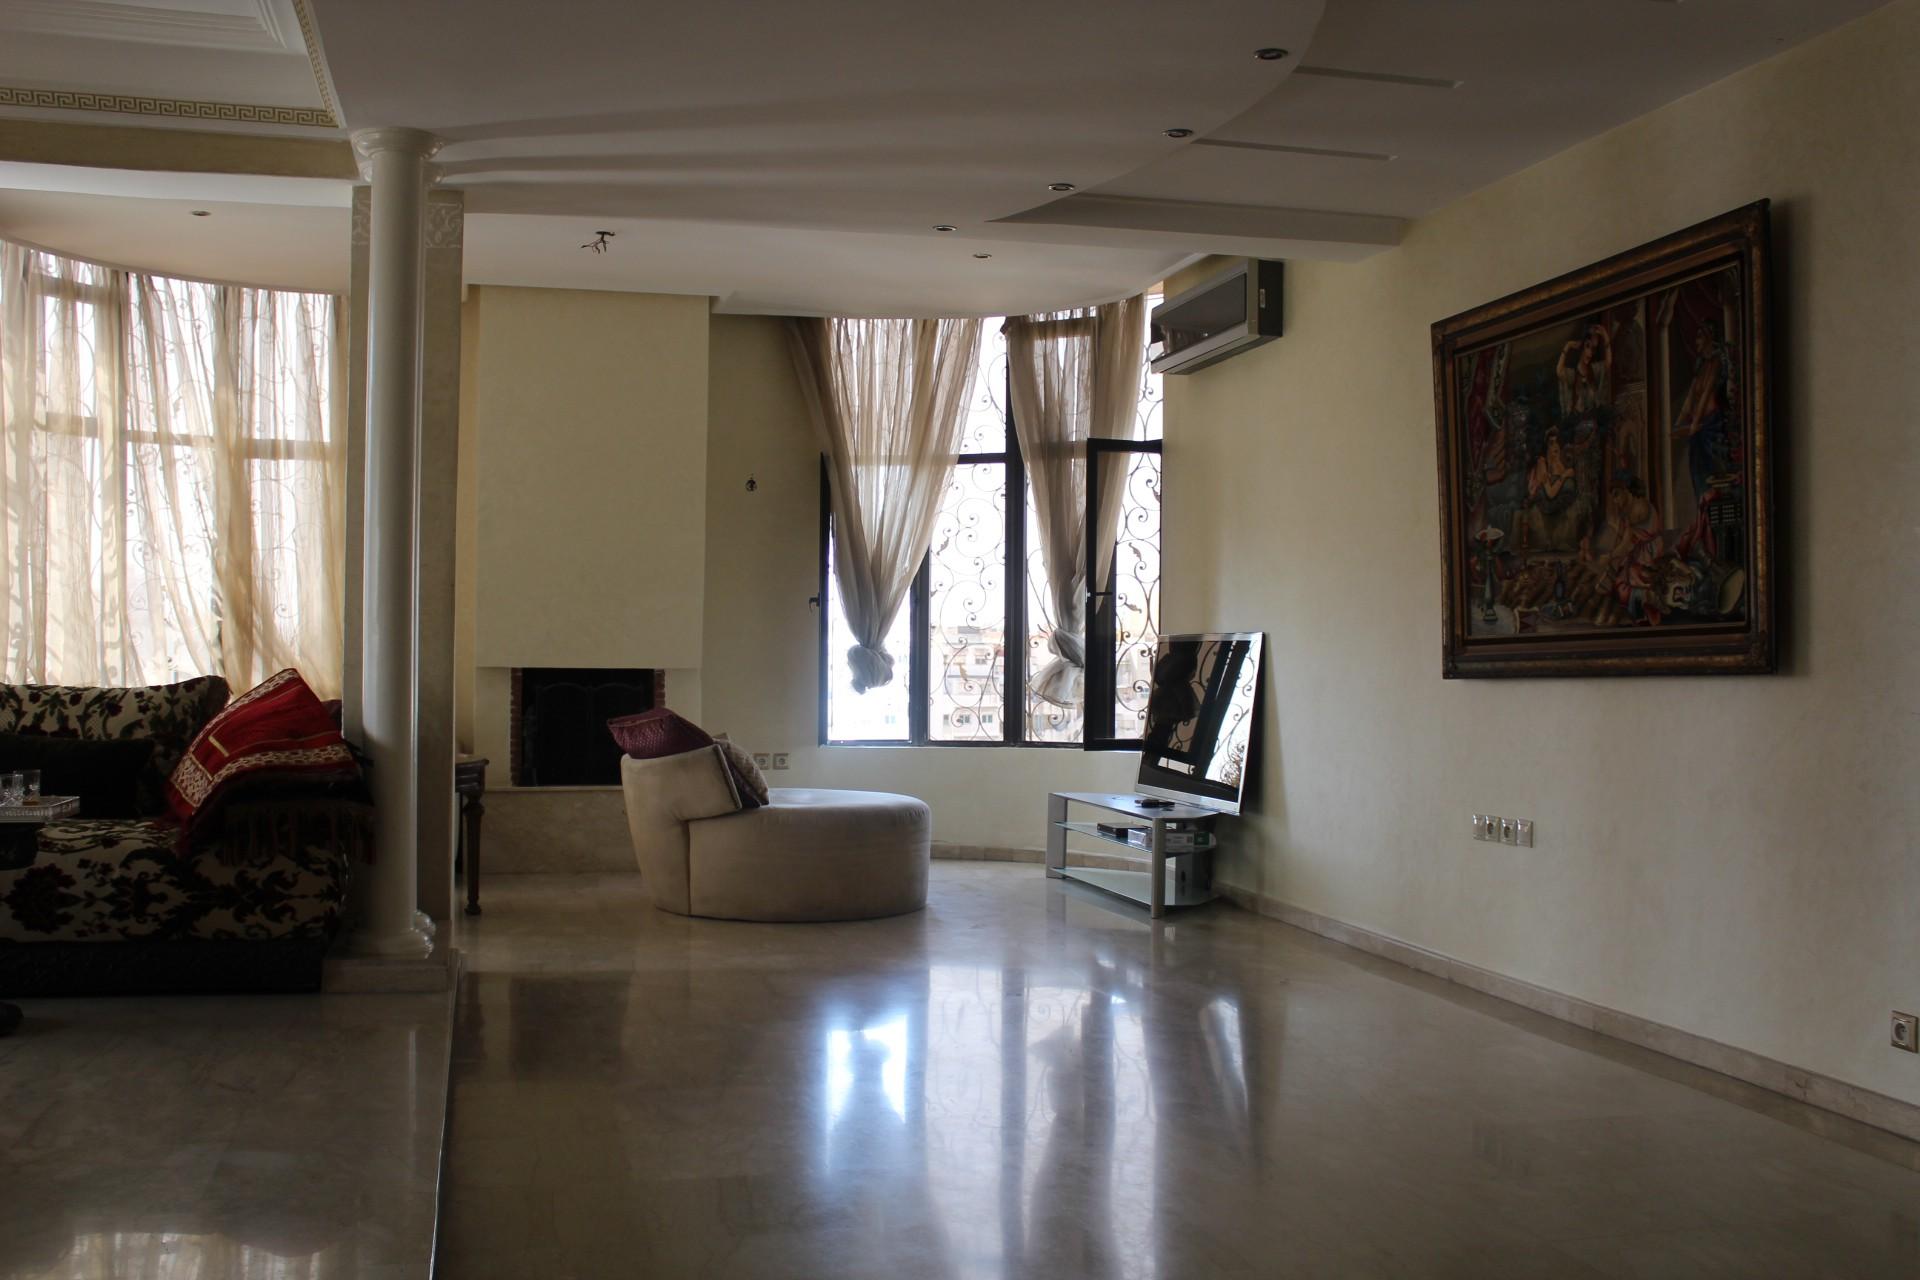 Maroc, Casablanca proche Bld Ghandi(Lydec) A louer Bureau lumineuxde 119 m².